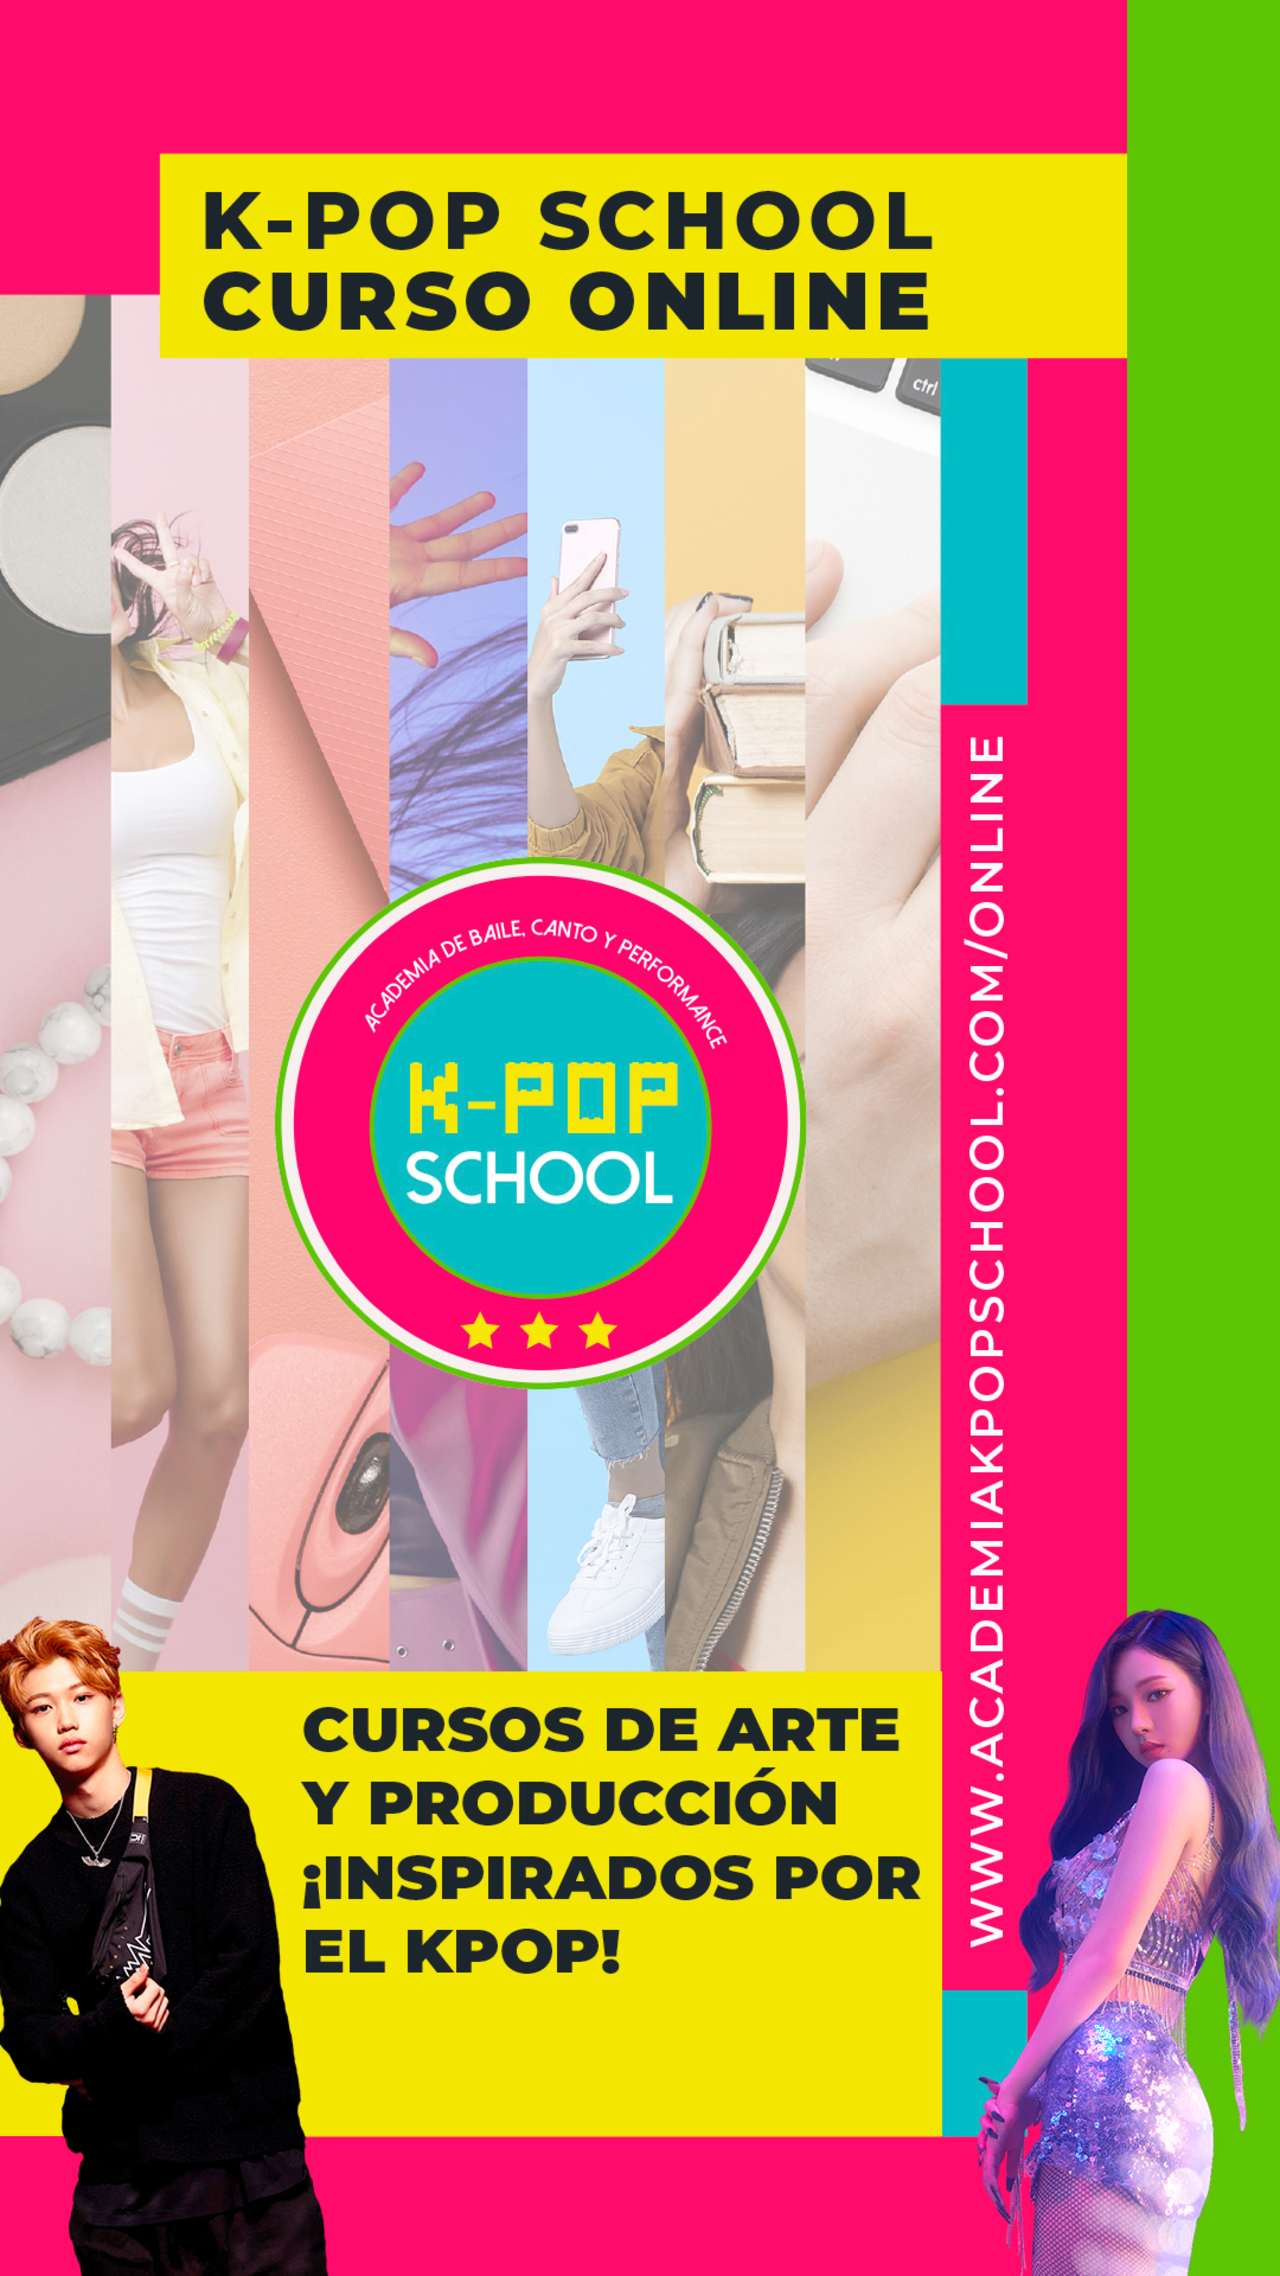 KPop School academia latinoamérica